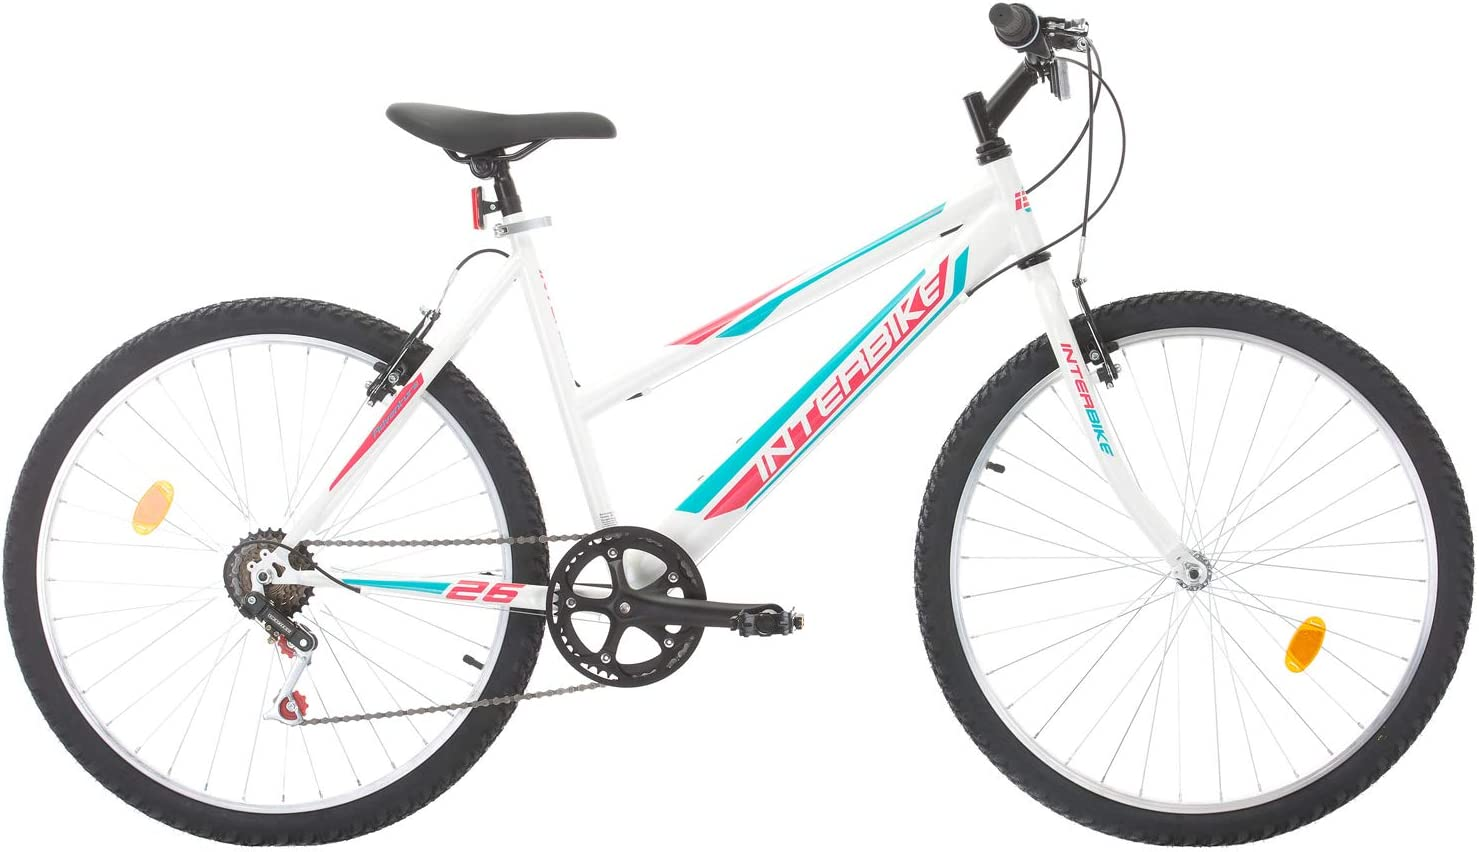 Bikesport ENERGY Bicicleta de montaña para mujer, rueda 26 ...